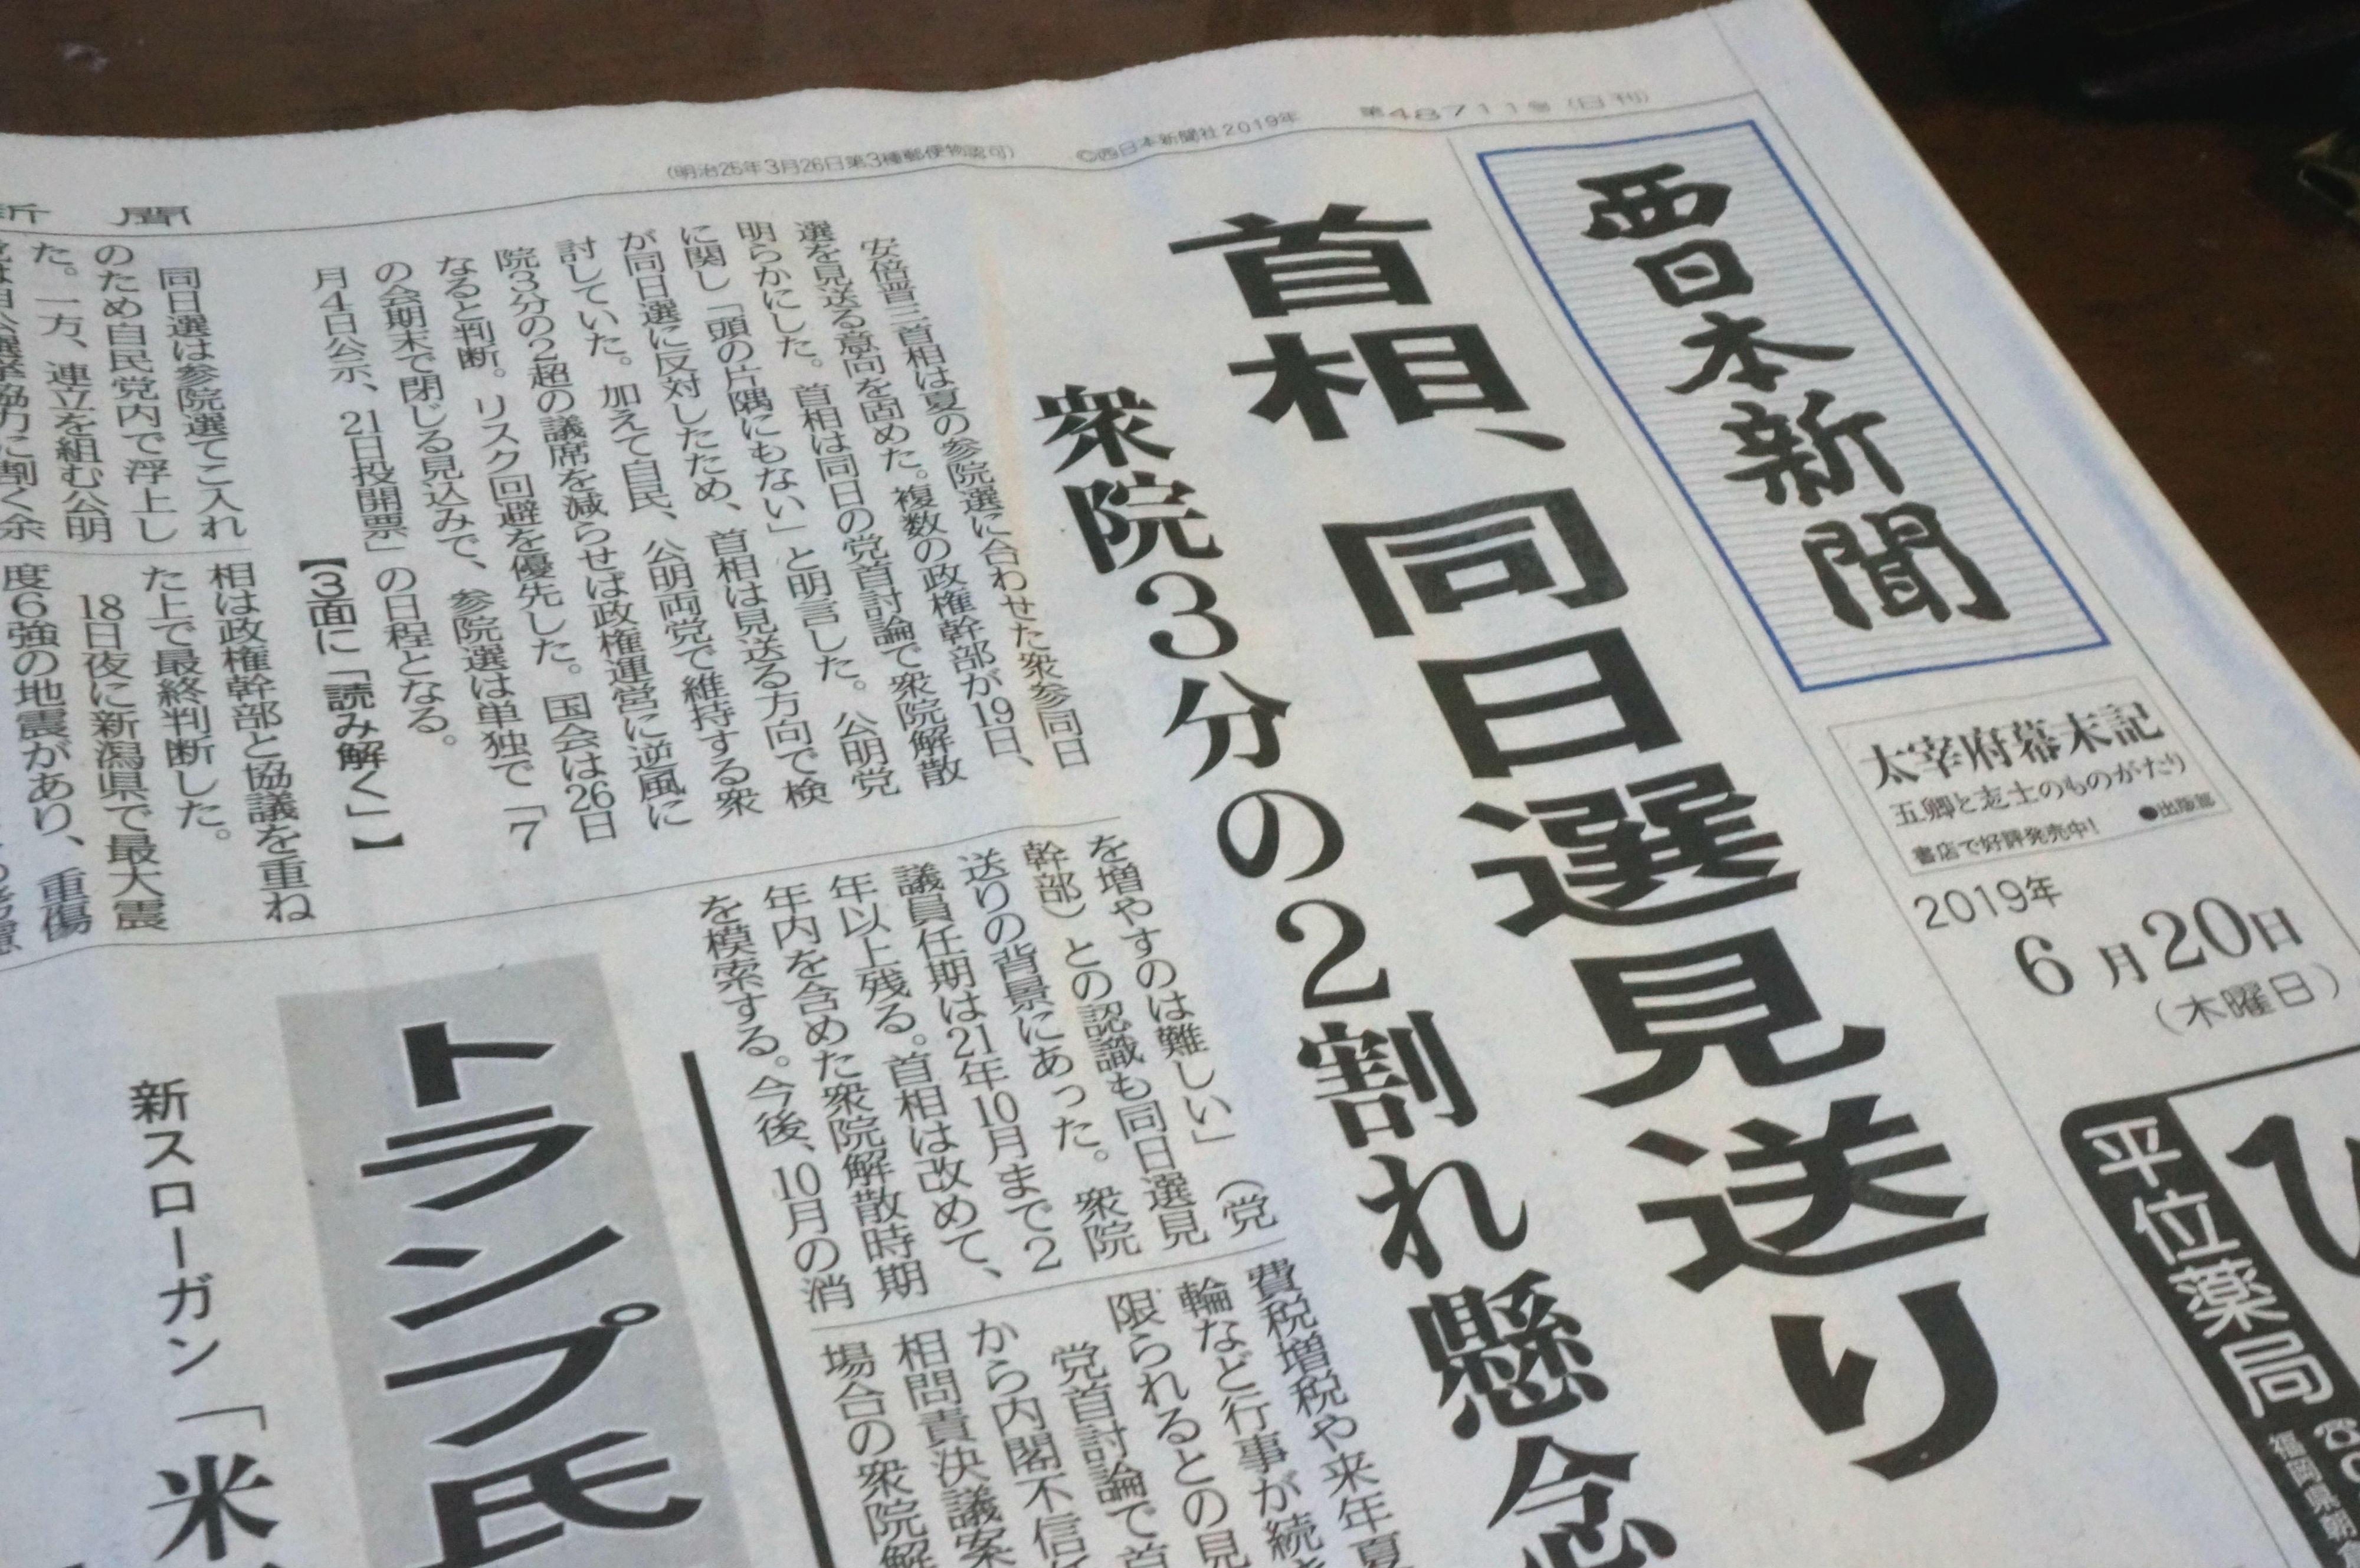 http://hunter-investigate.jp/news/6bf239ffd01b459dccb8774f95699a8773e1be76.JPG